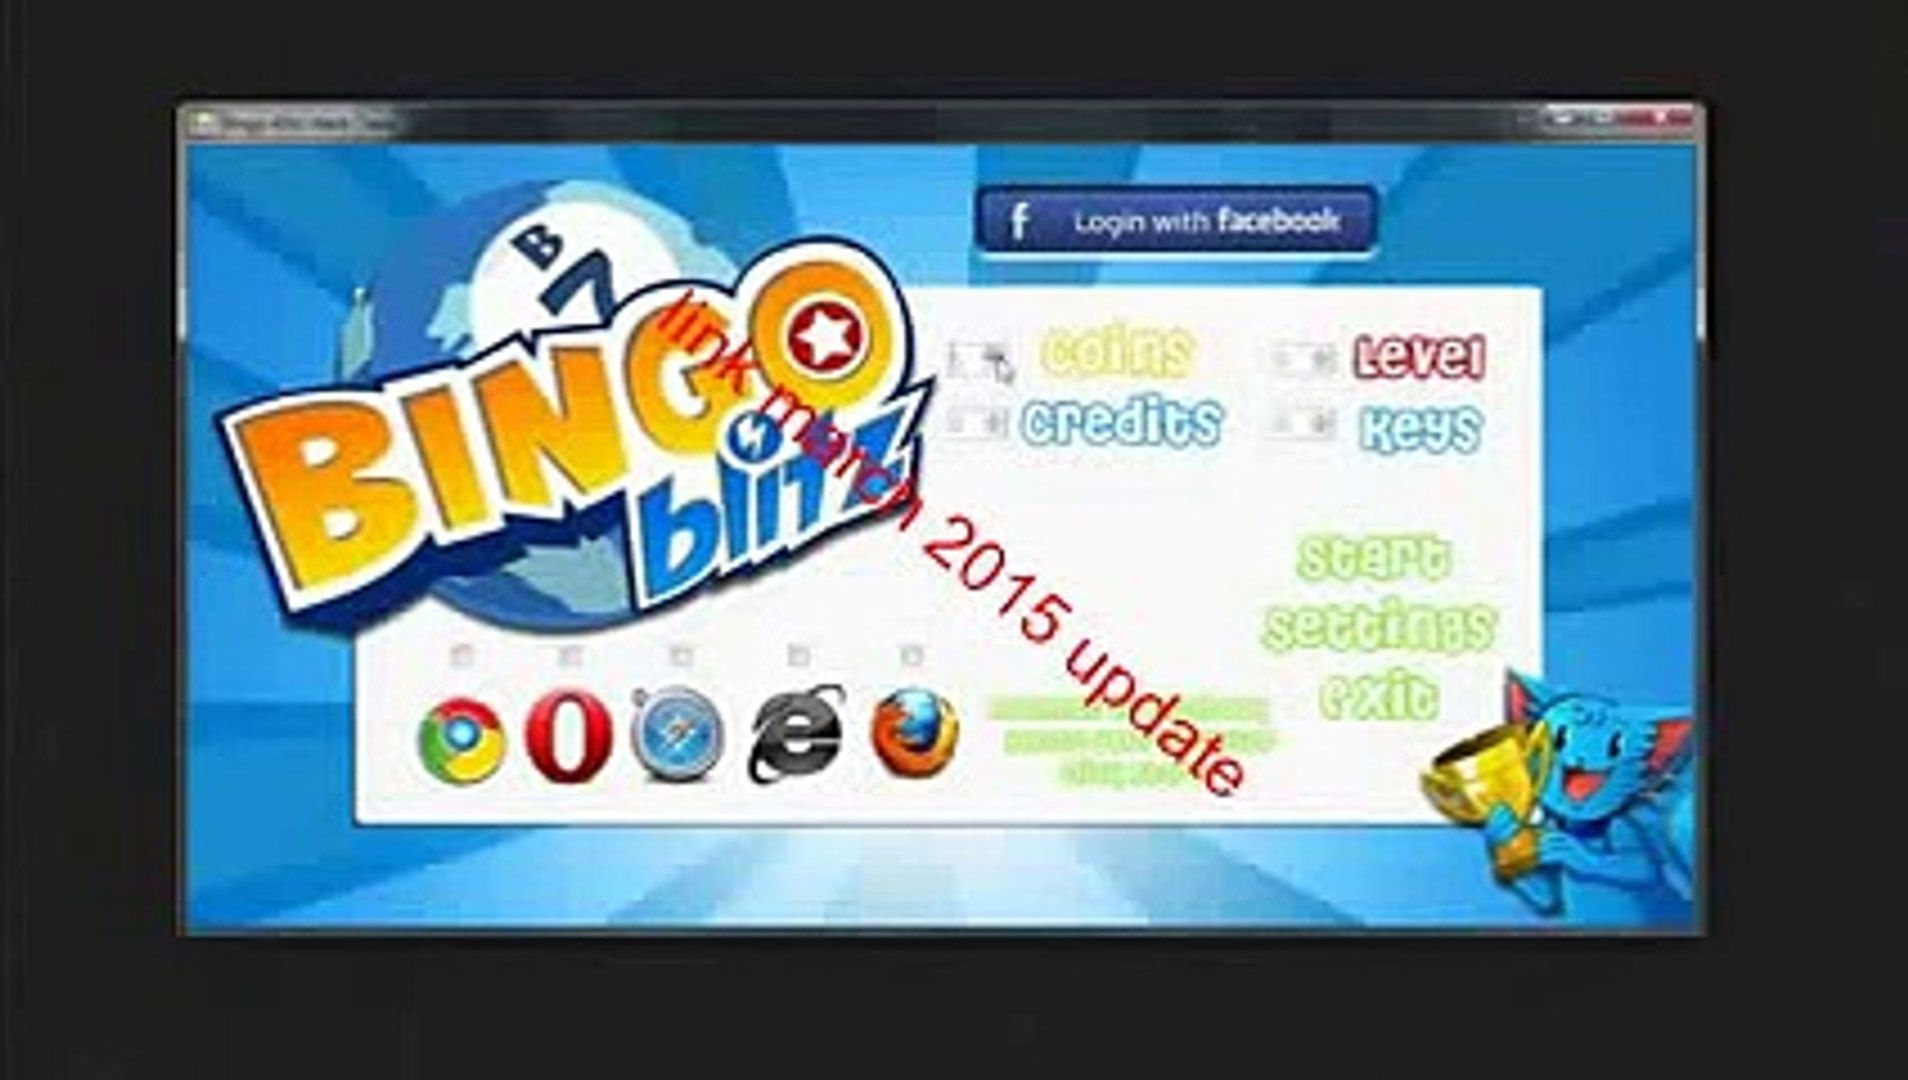 Bingo Blitz Hack   Pirater Updated FREE Download [21_06_2015]